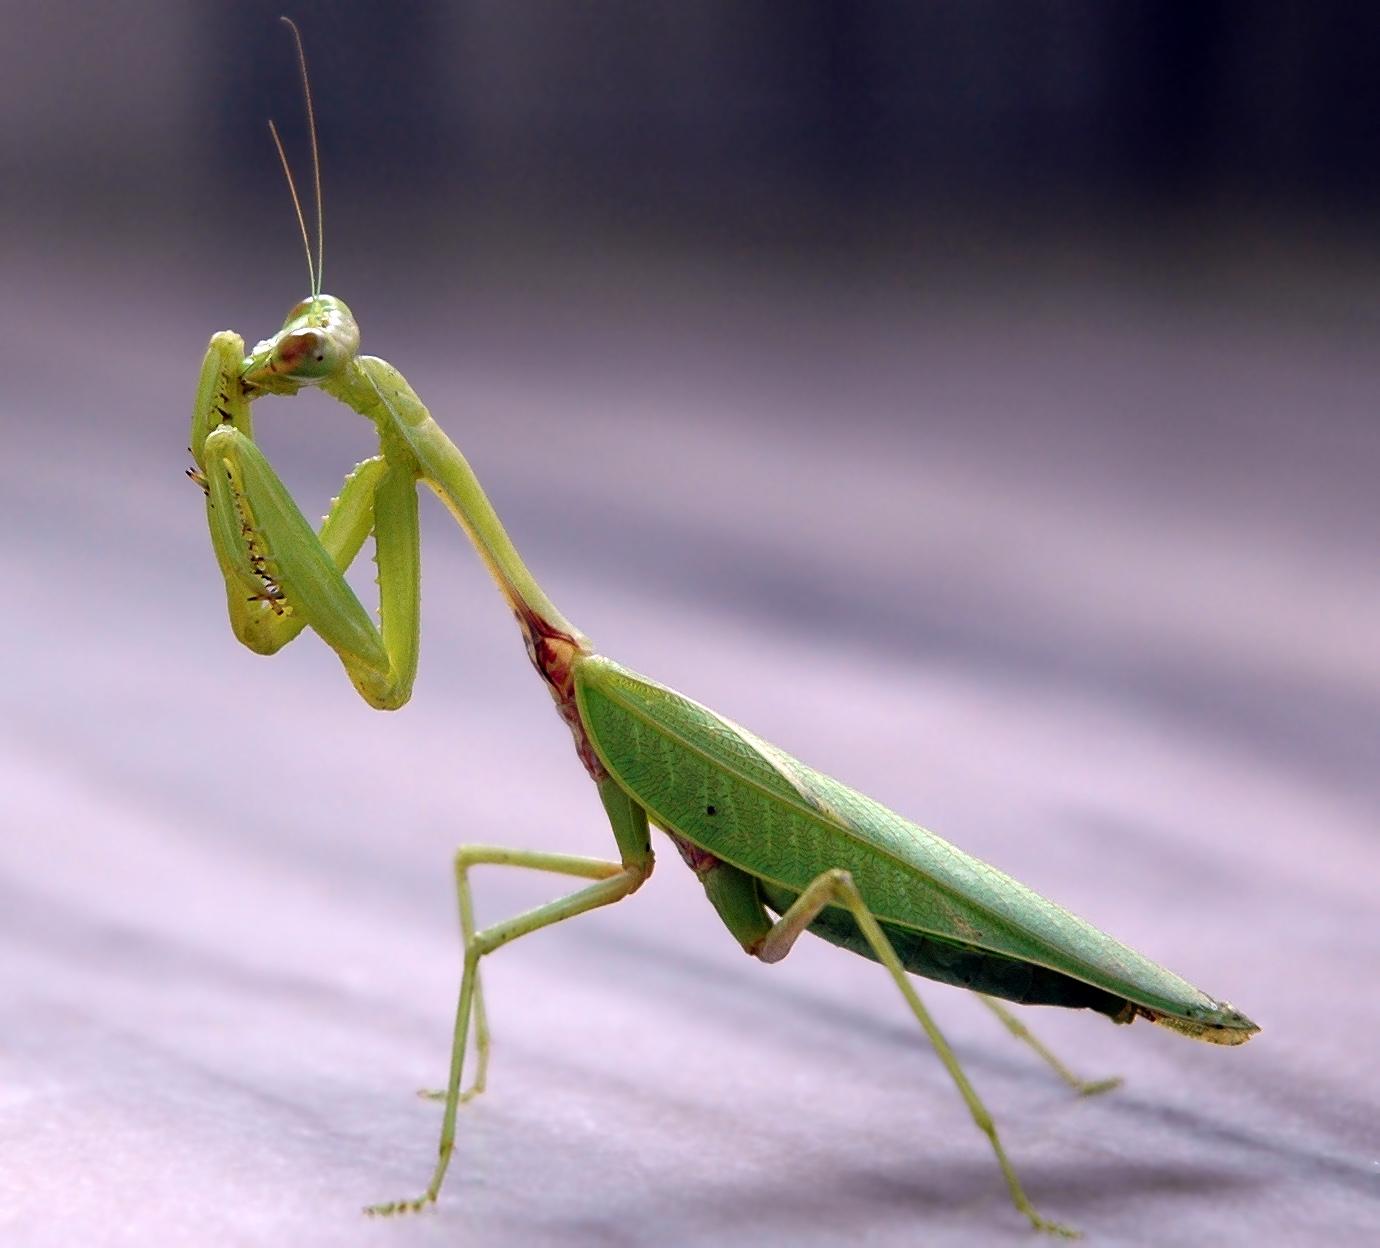 Praying Mantis High Quality Background on Wallpapers Vista